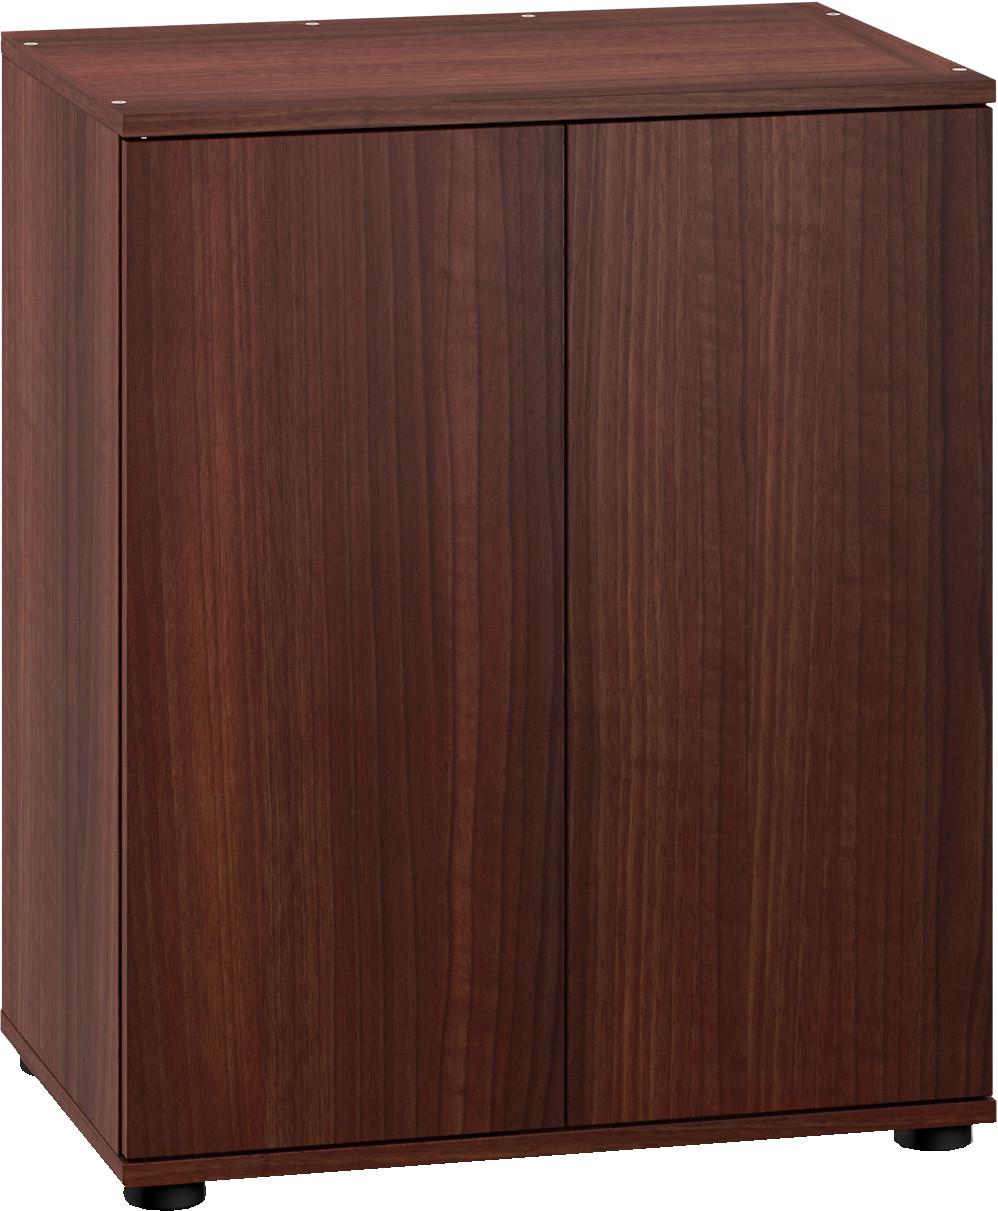 Juwel meubel Lido 120 dark wood